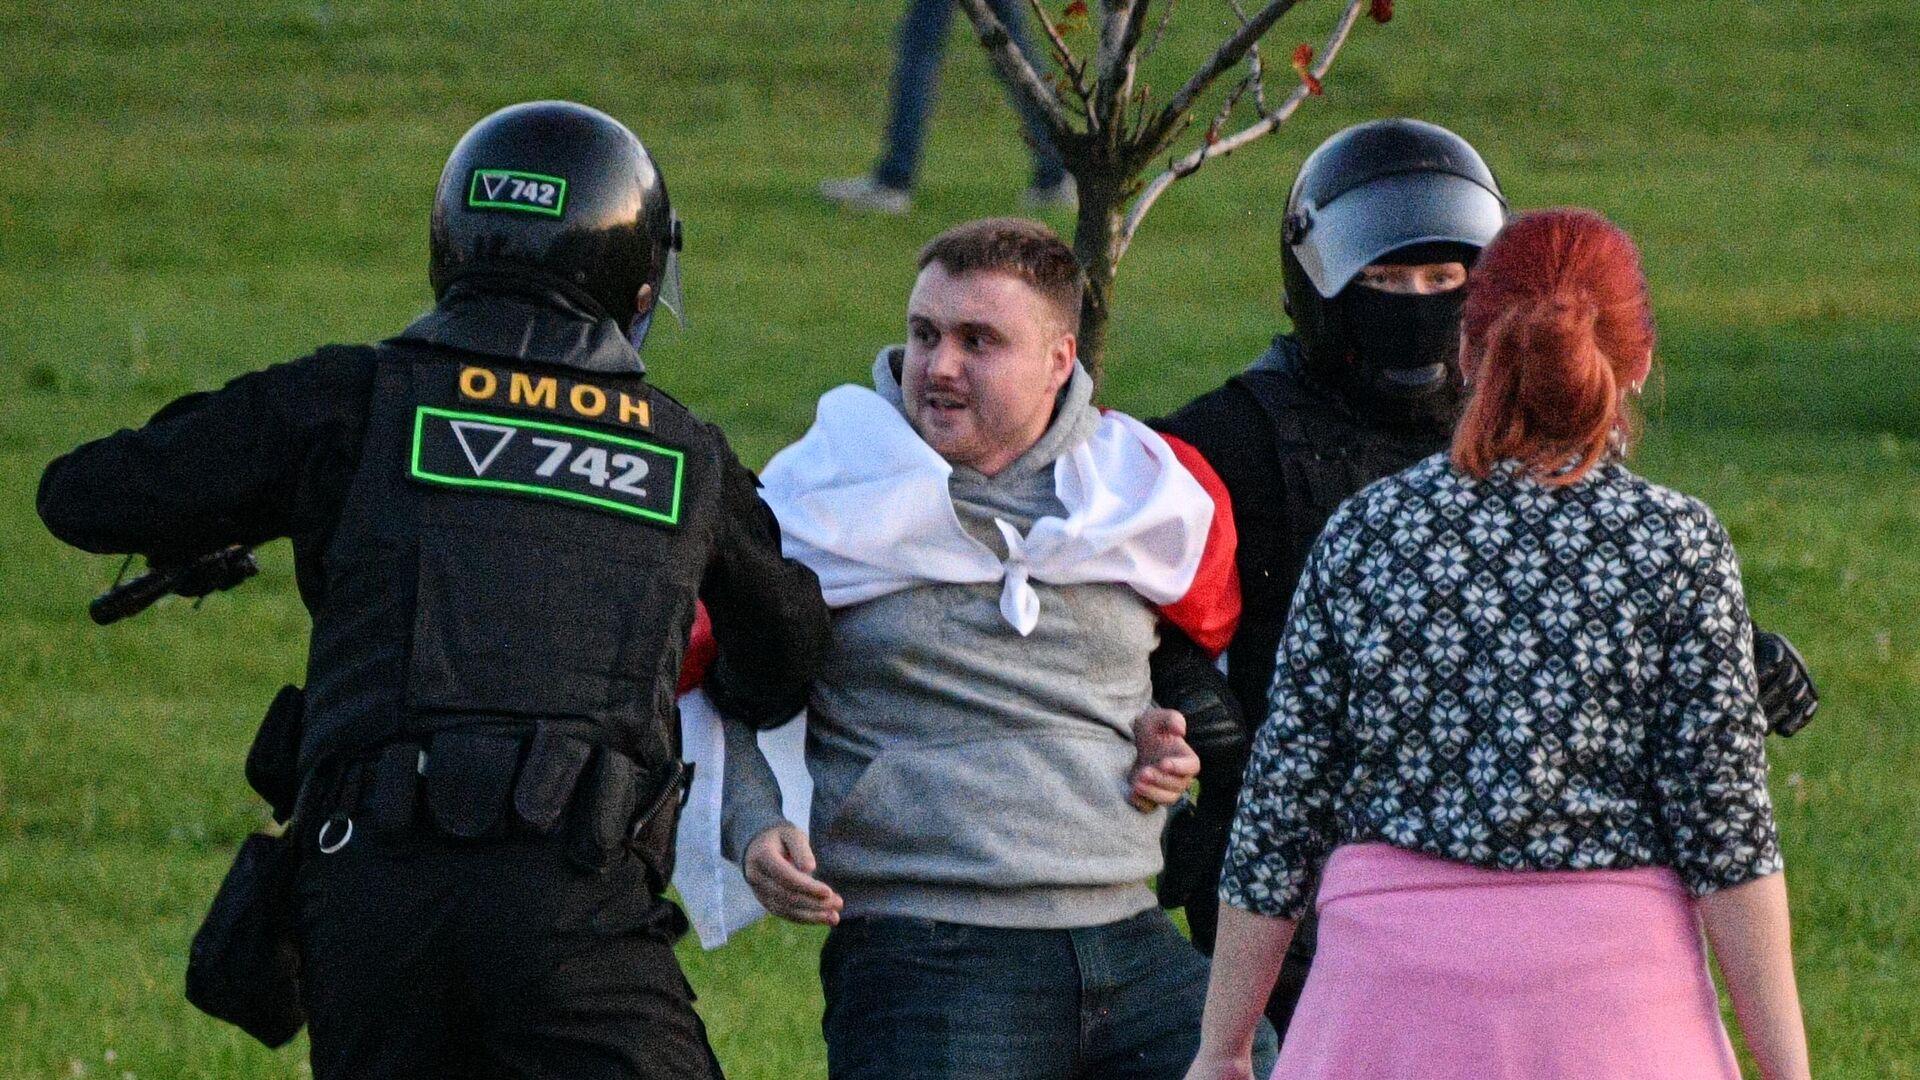 Сотрудники милиции задерживают участника акции протеста в Минске - РИА Новости, 1920, 24.09.2020